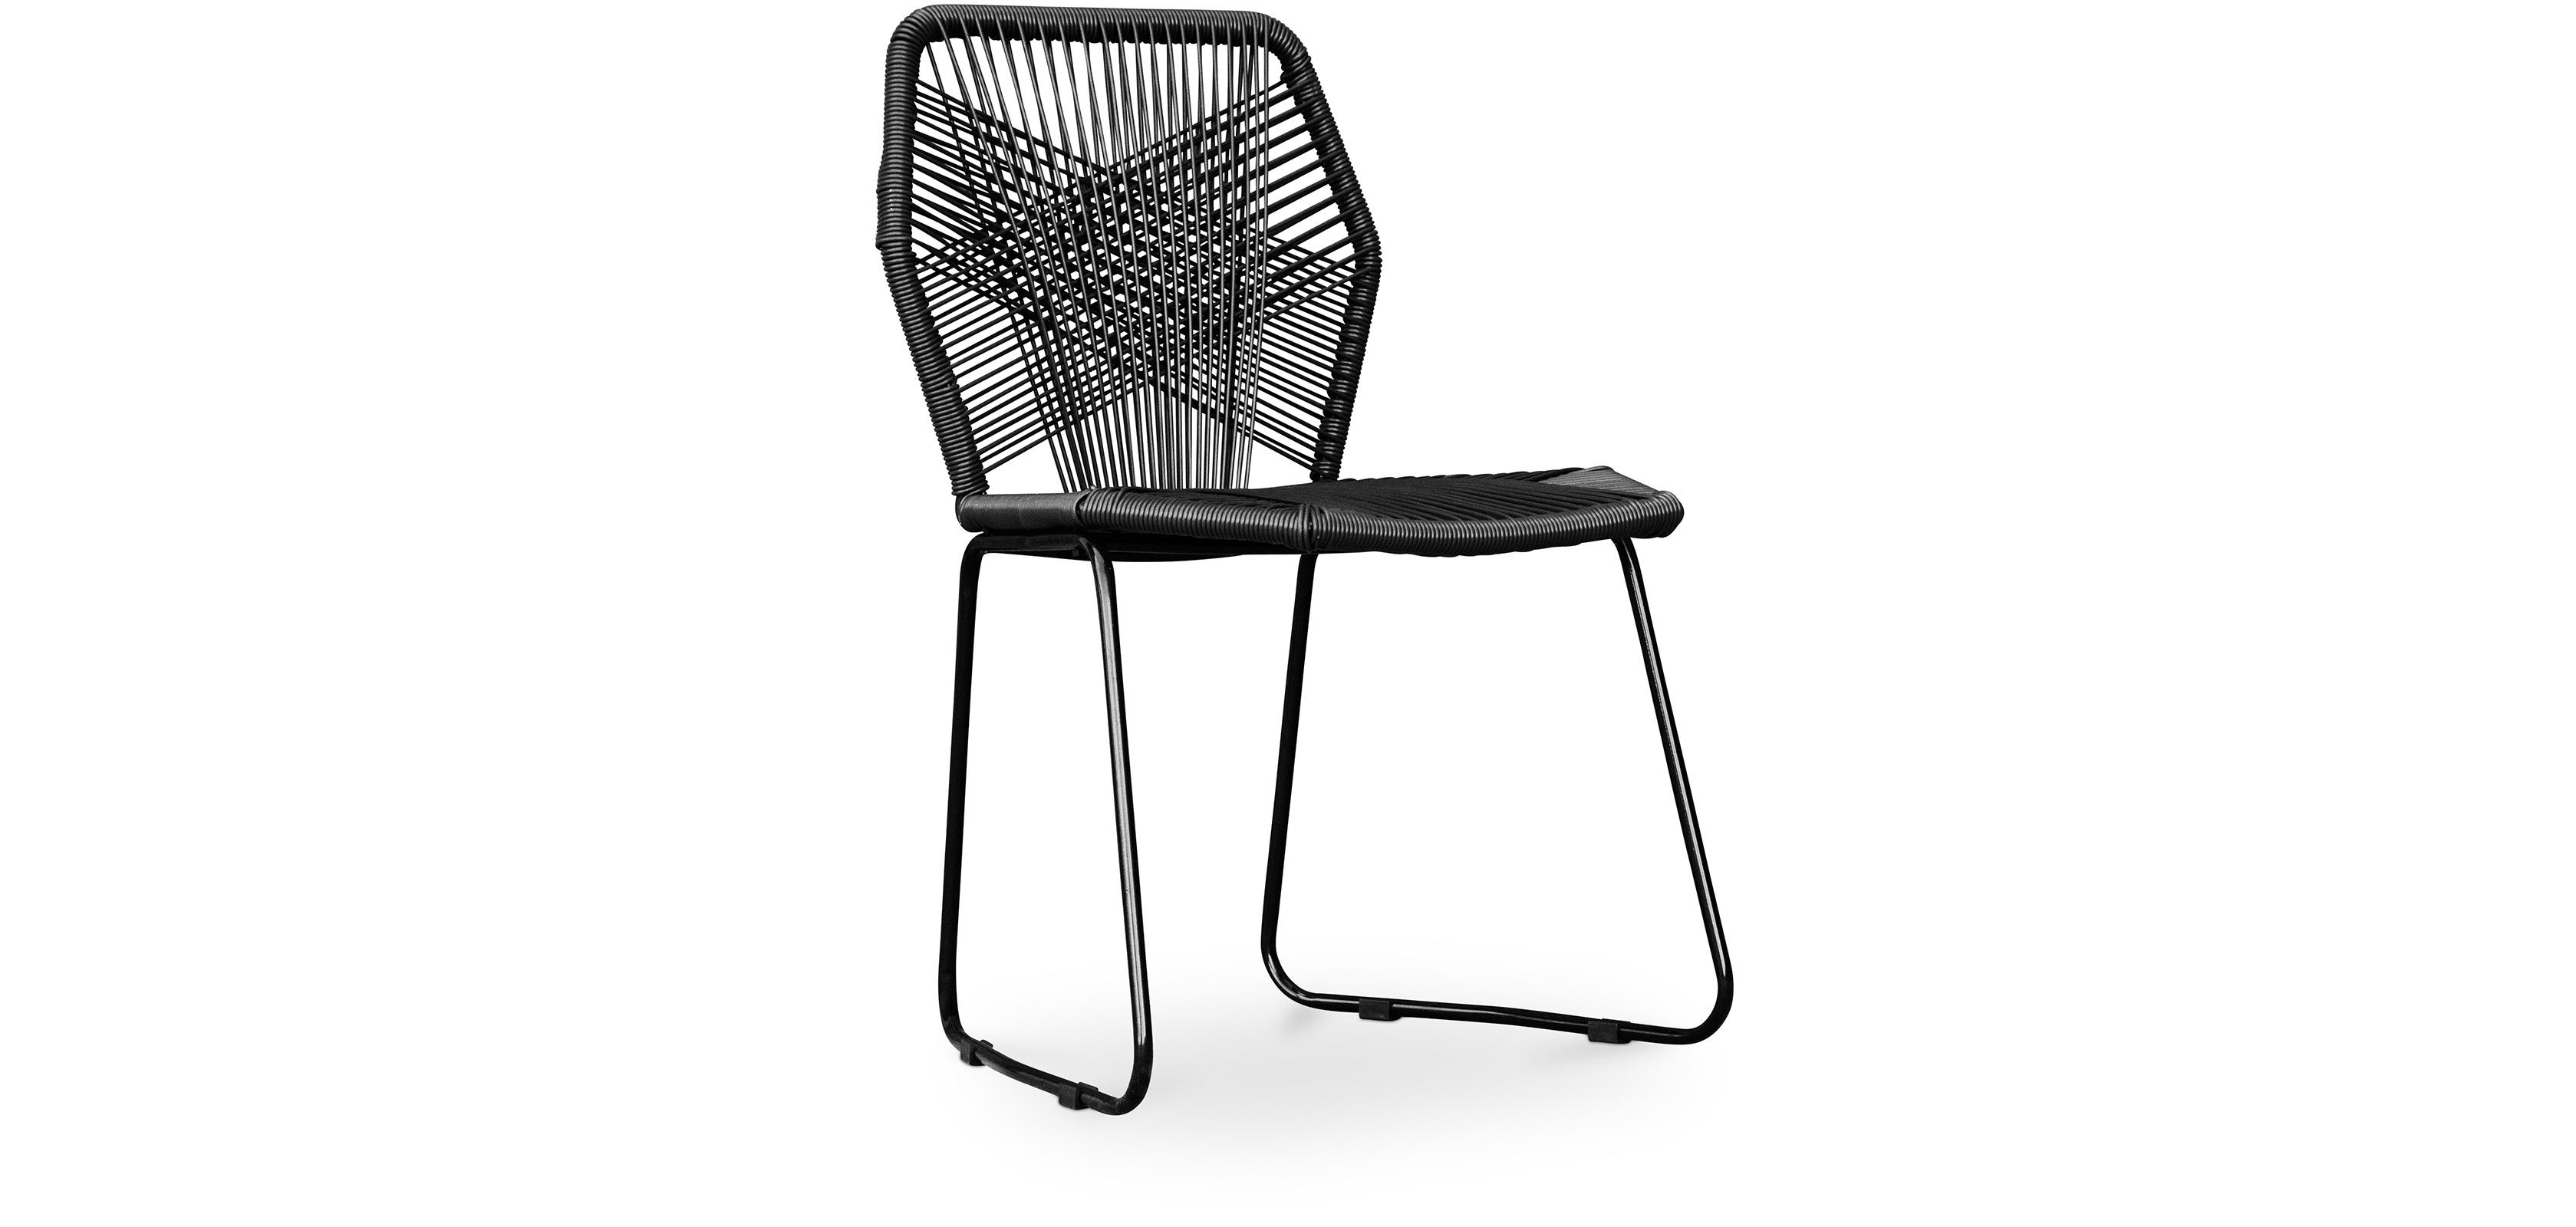 gartenstuhl tropicalia patricia urquiola style schwarze beine. Black Bedroom Furniture Sets. Home Design Ideas